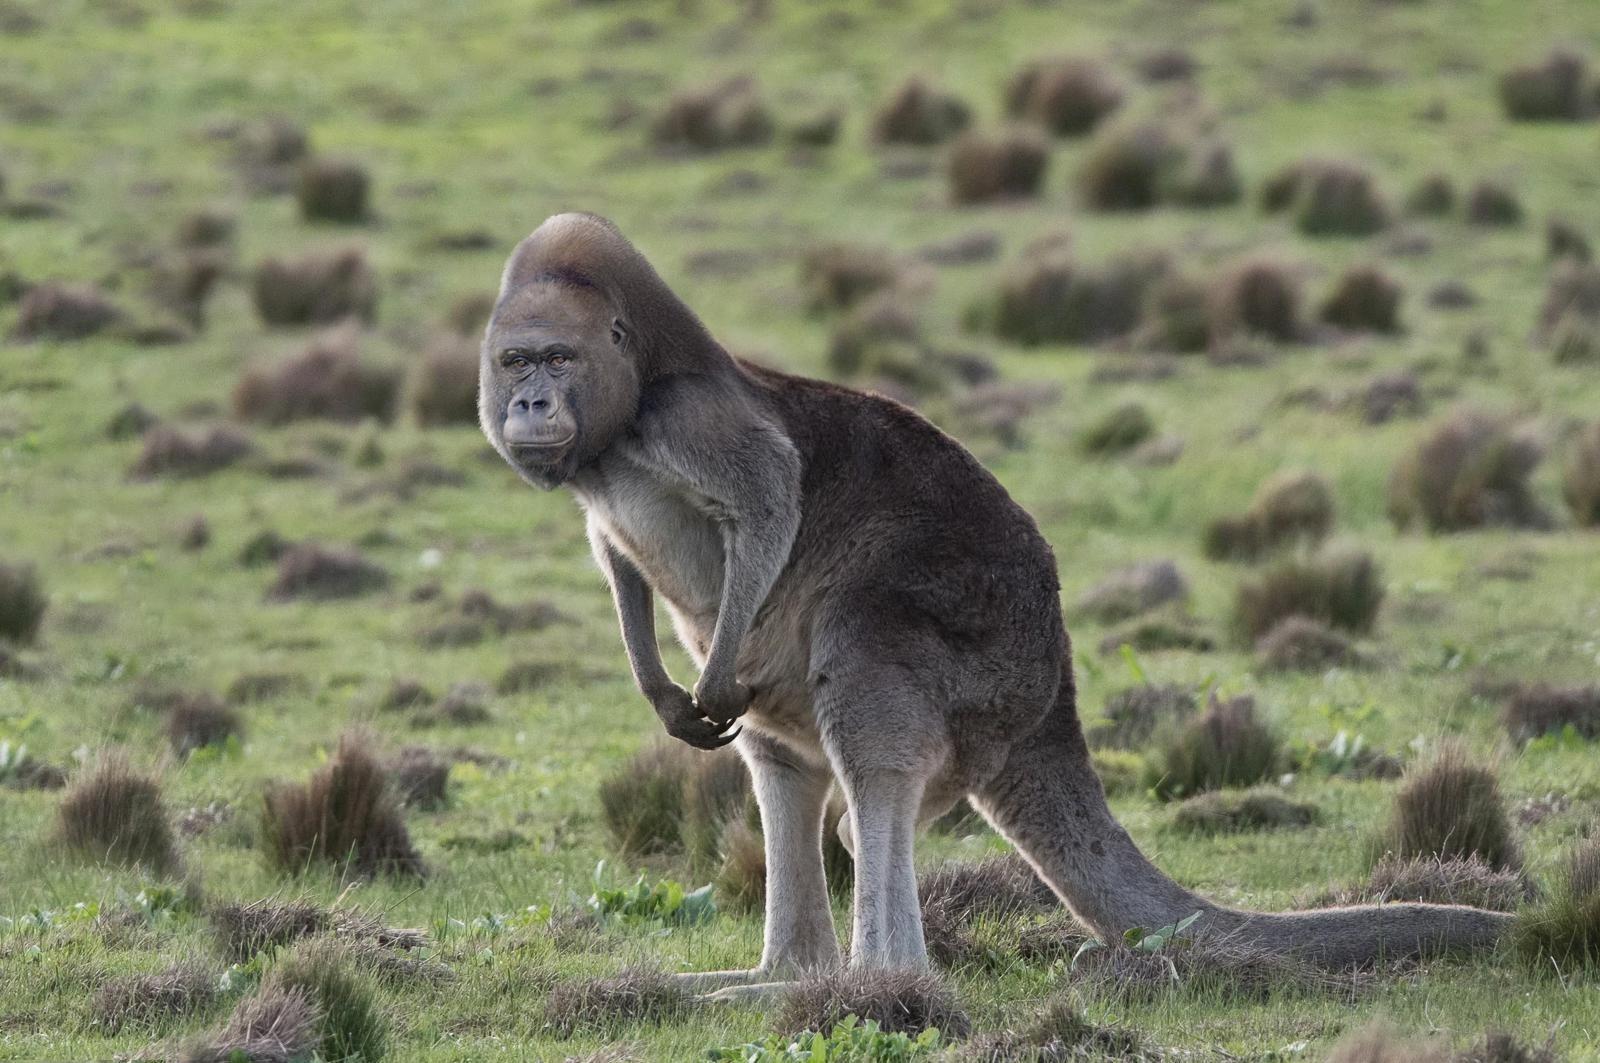 I photoshopped a gorilla and a kangaroo together